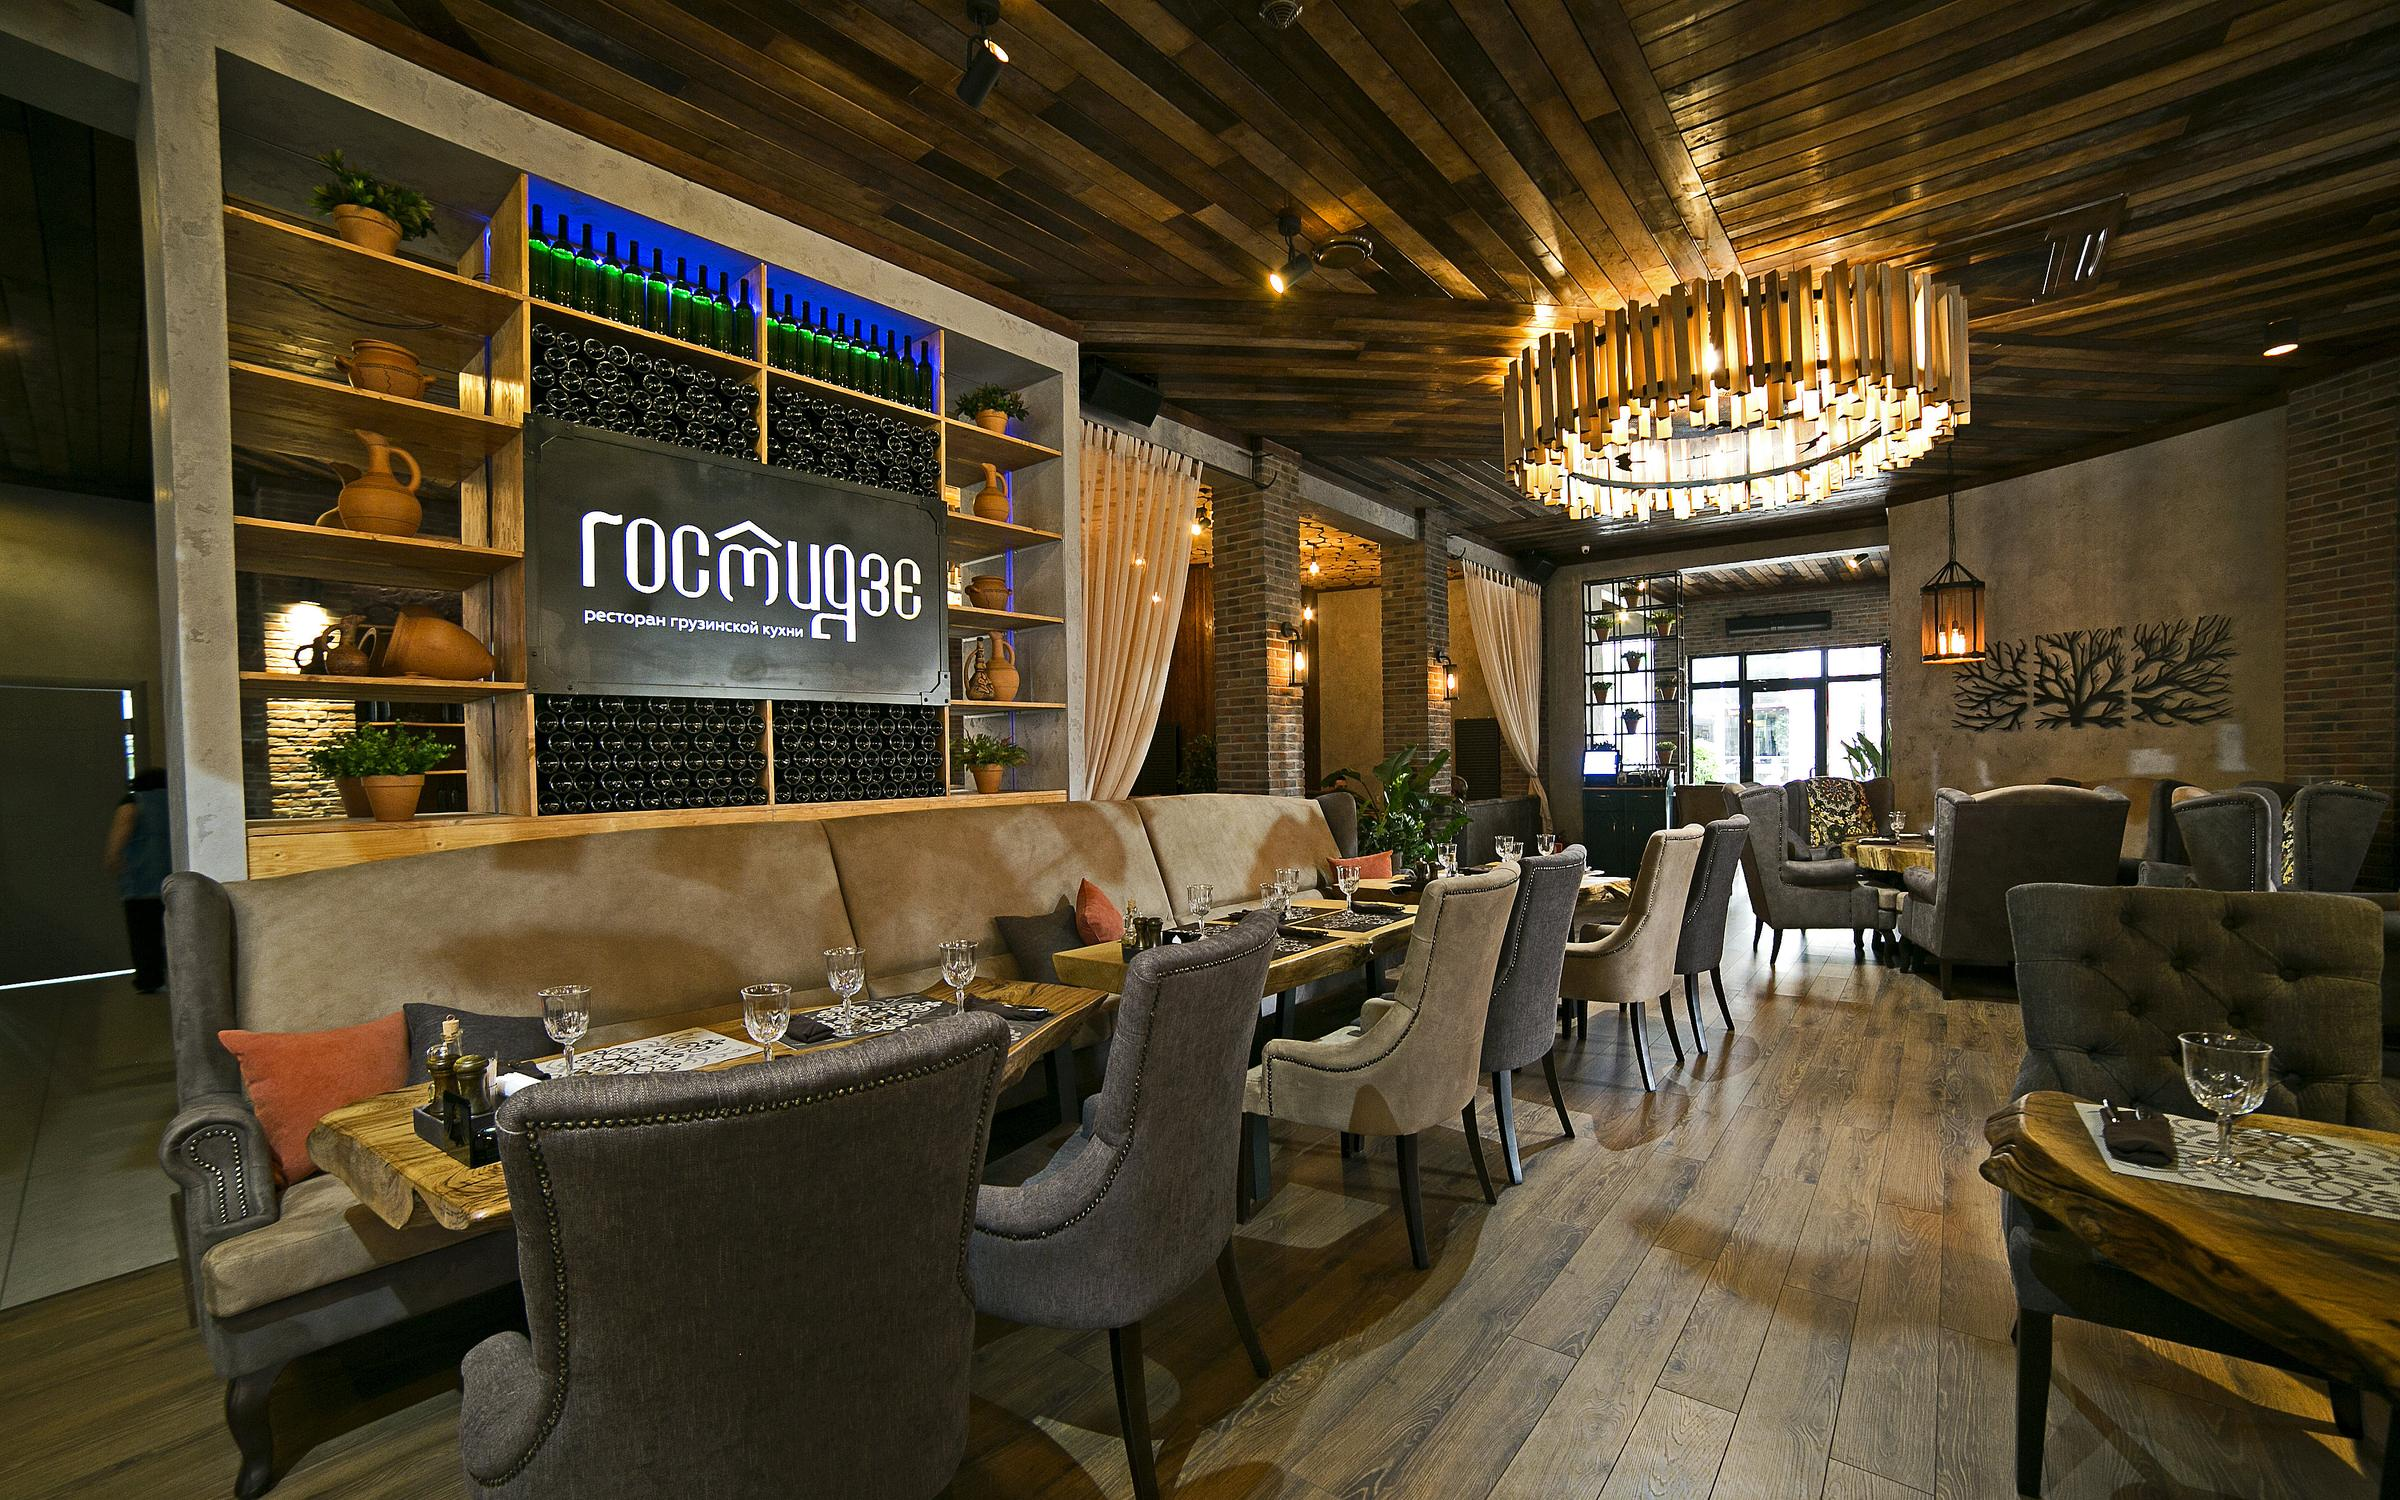 фотография Ресторана Гостидзе в Эсто-Садке